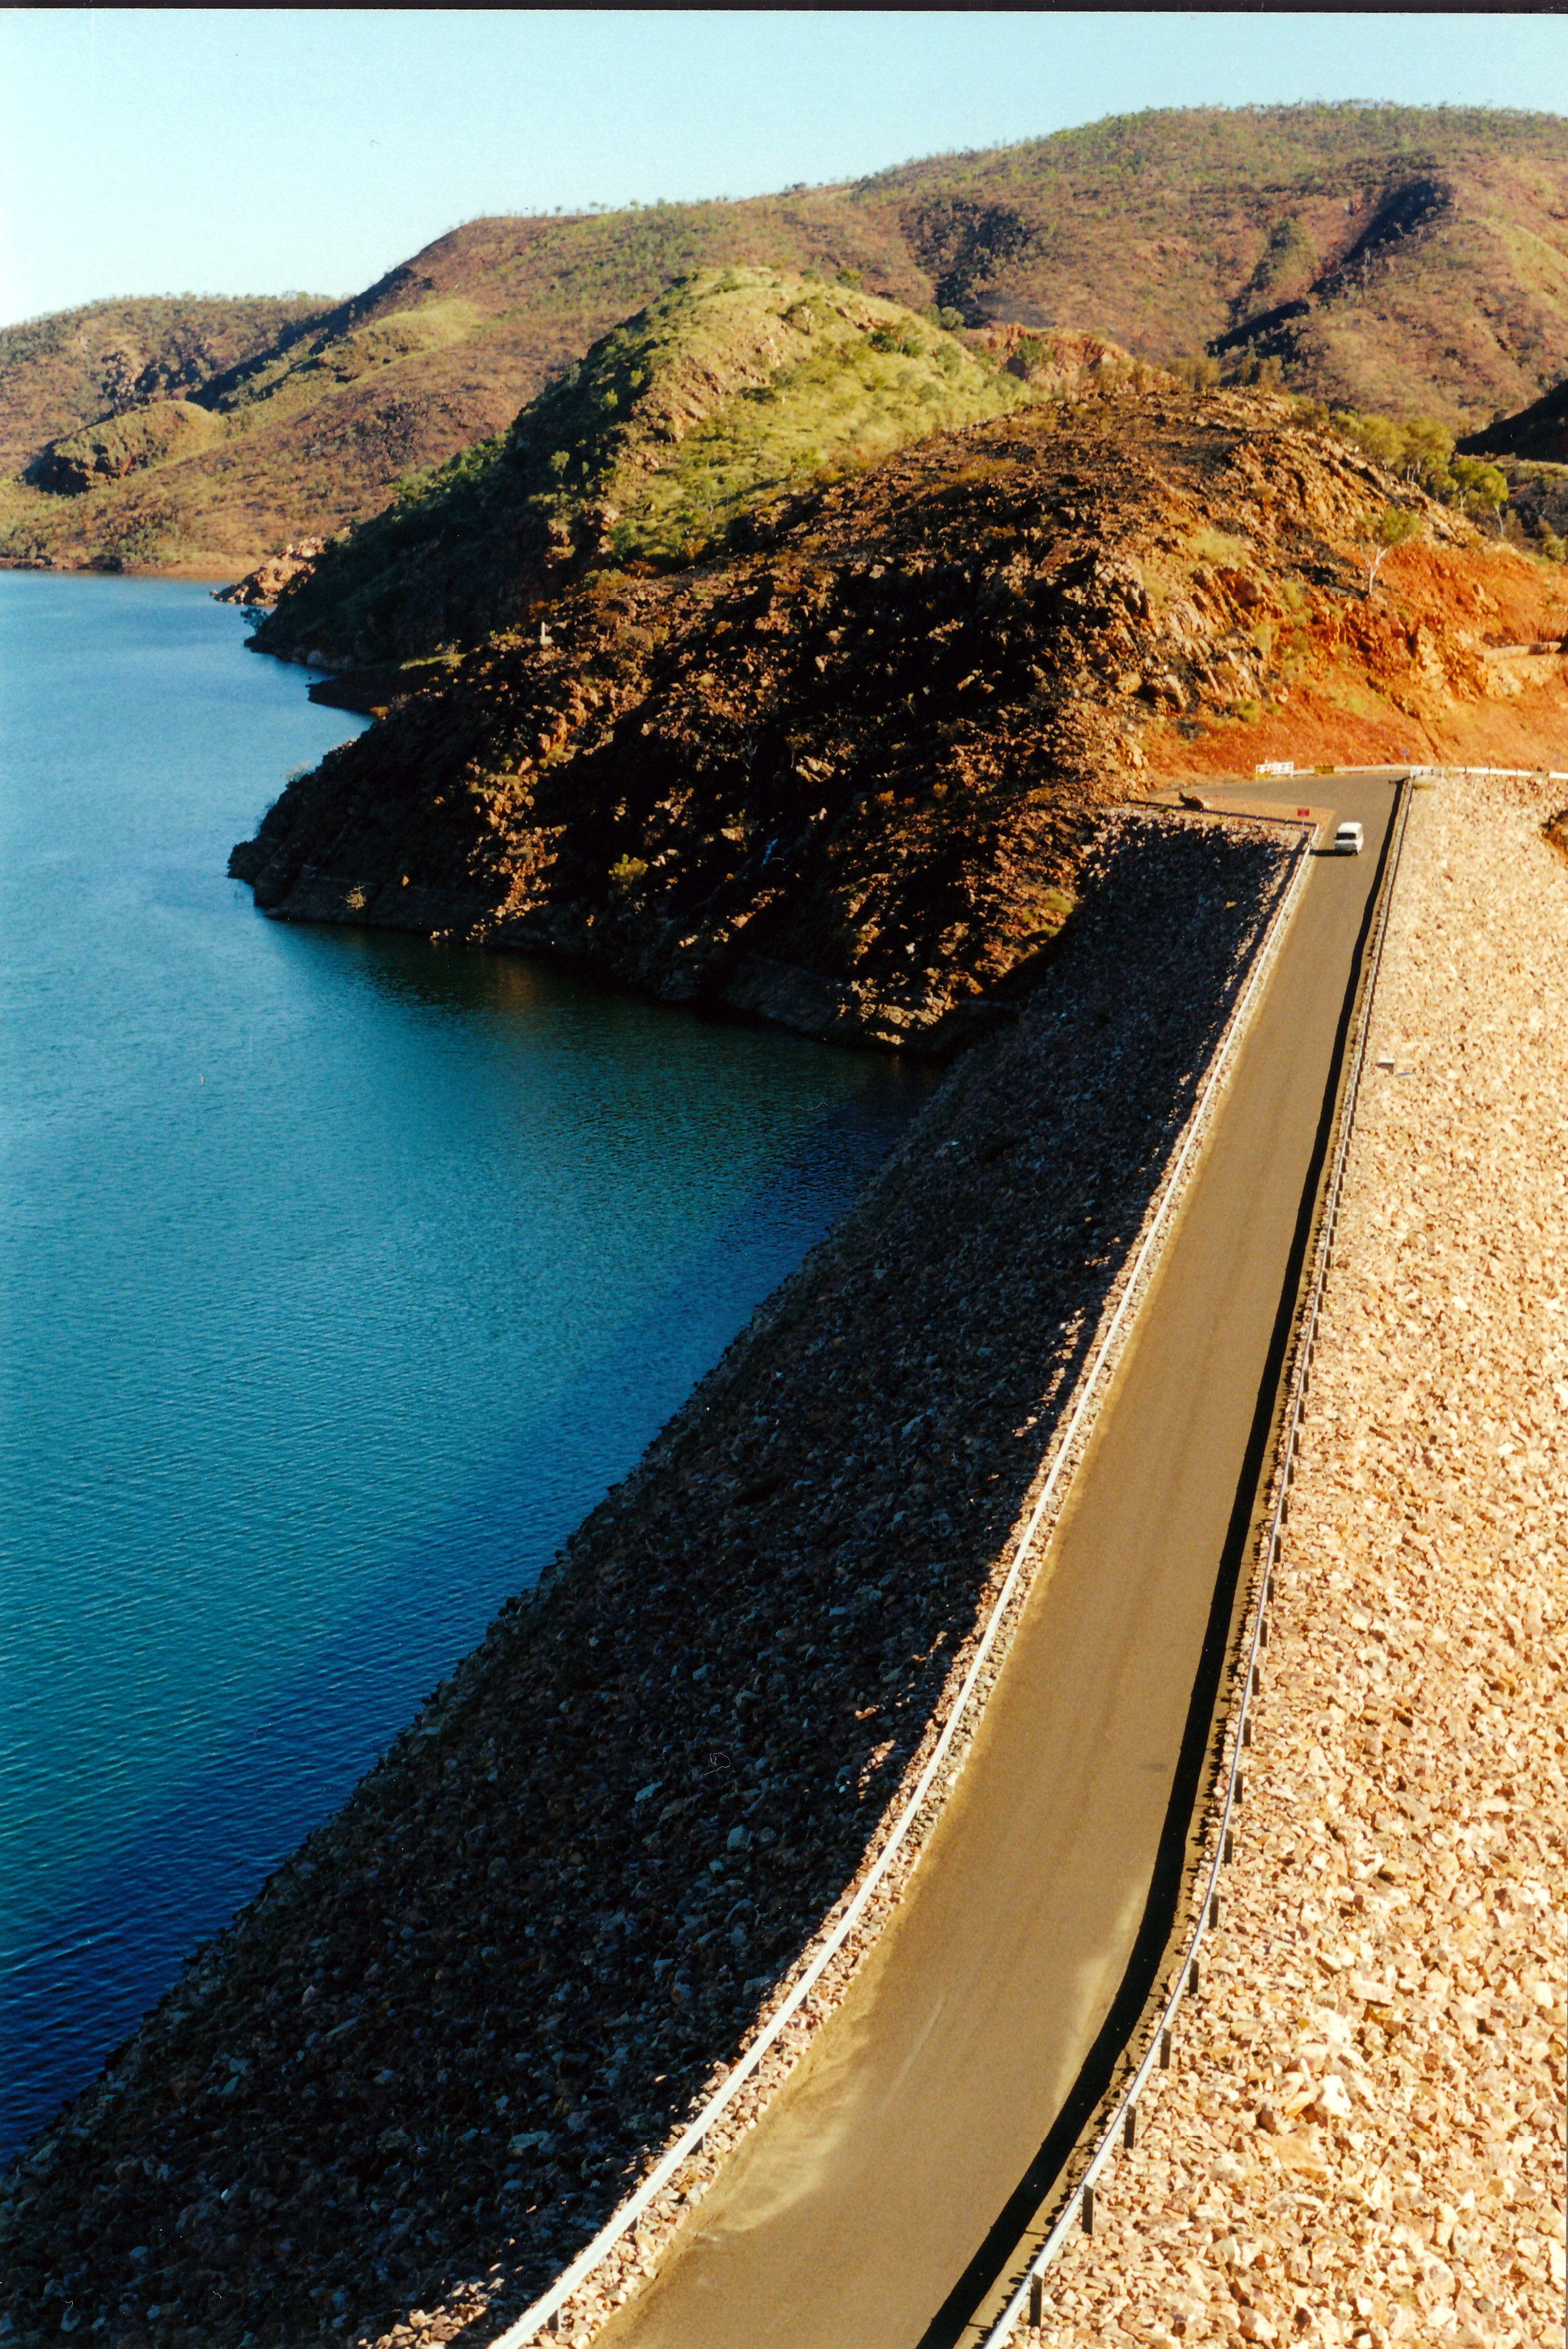 06-27-2000 02 argyle dam wall.jpg